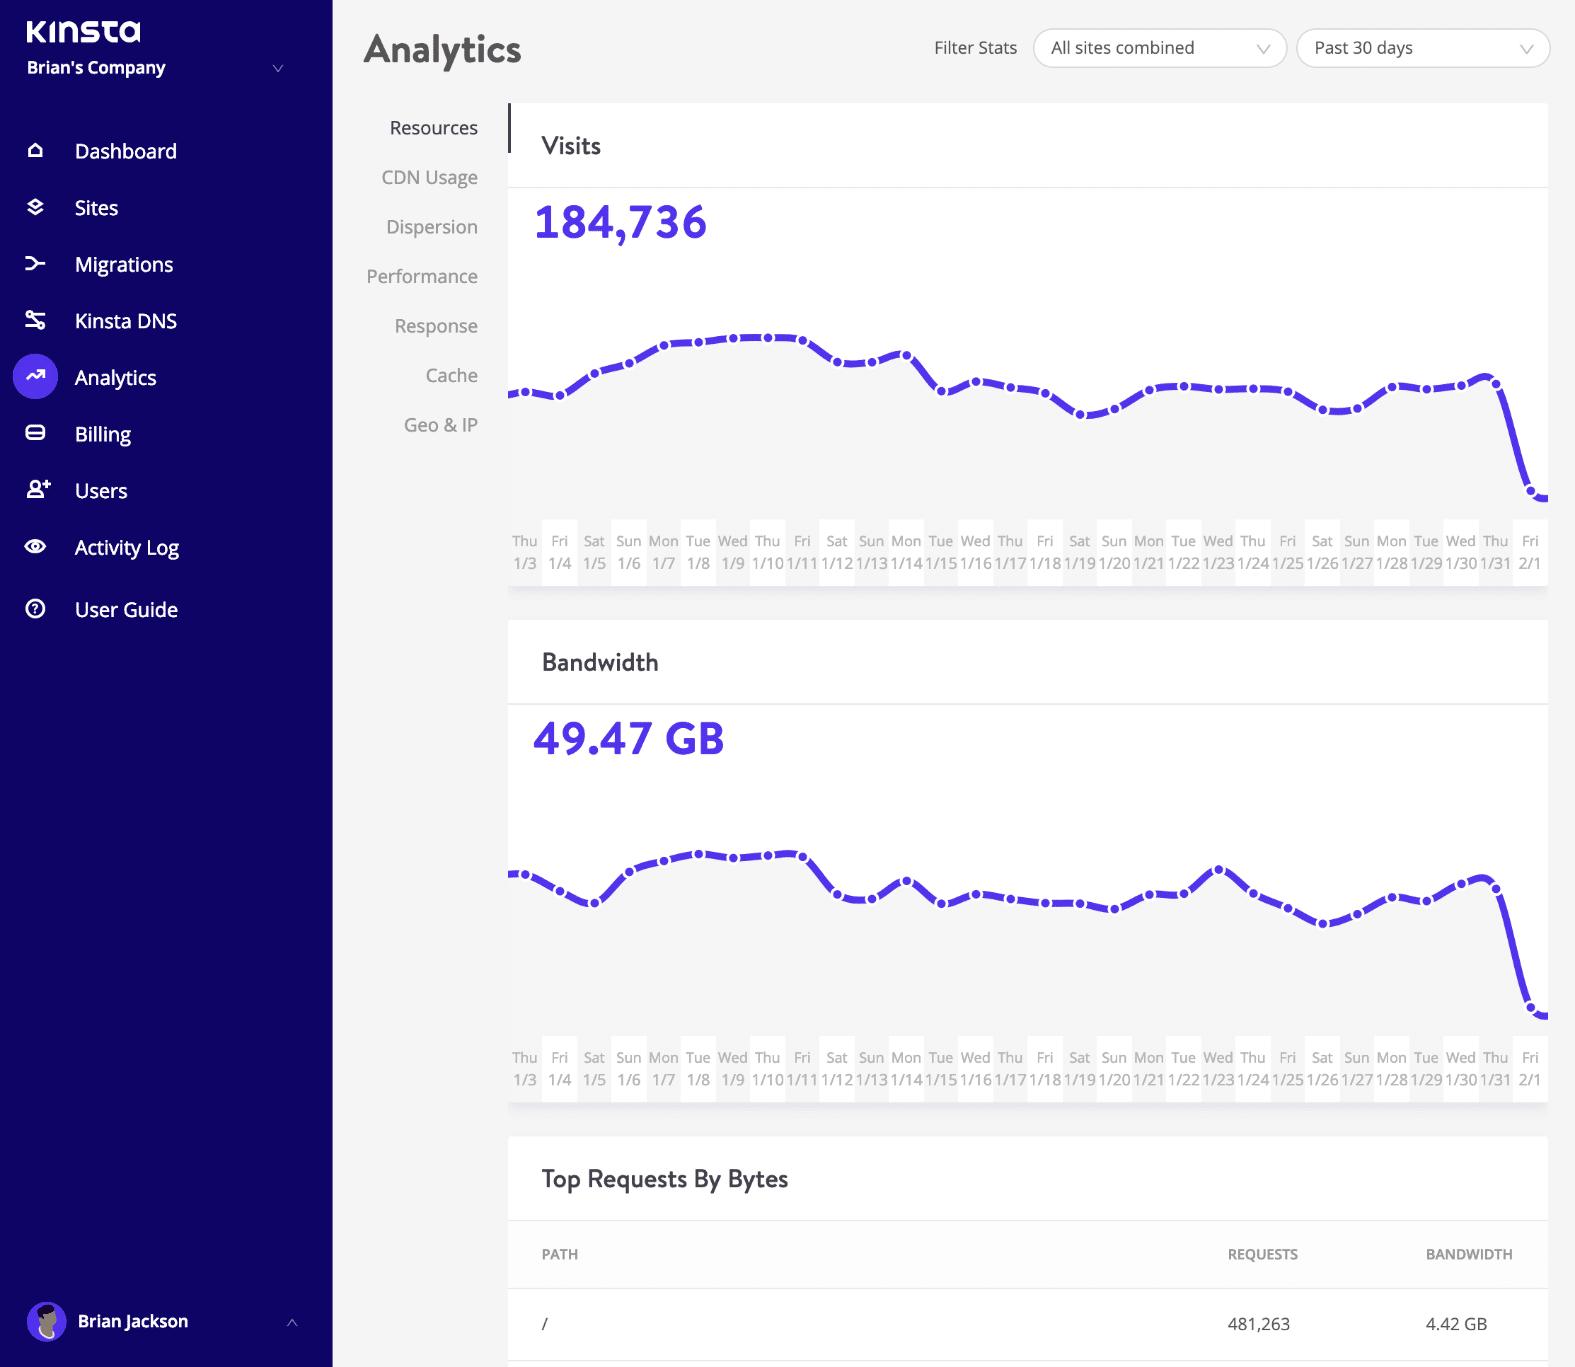 Analytics resourceverbruik